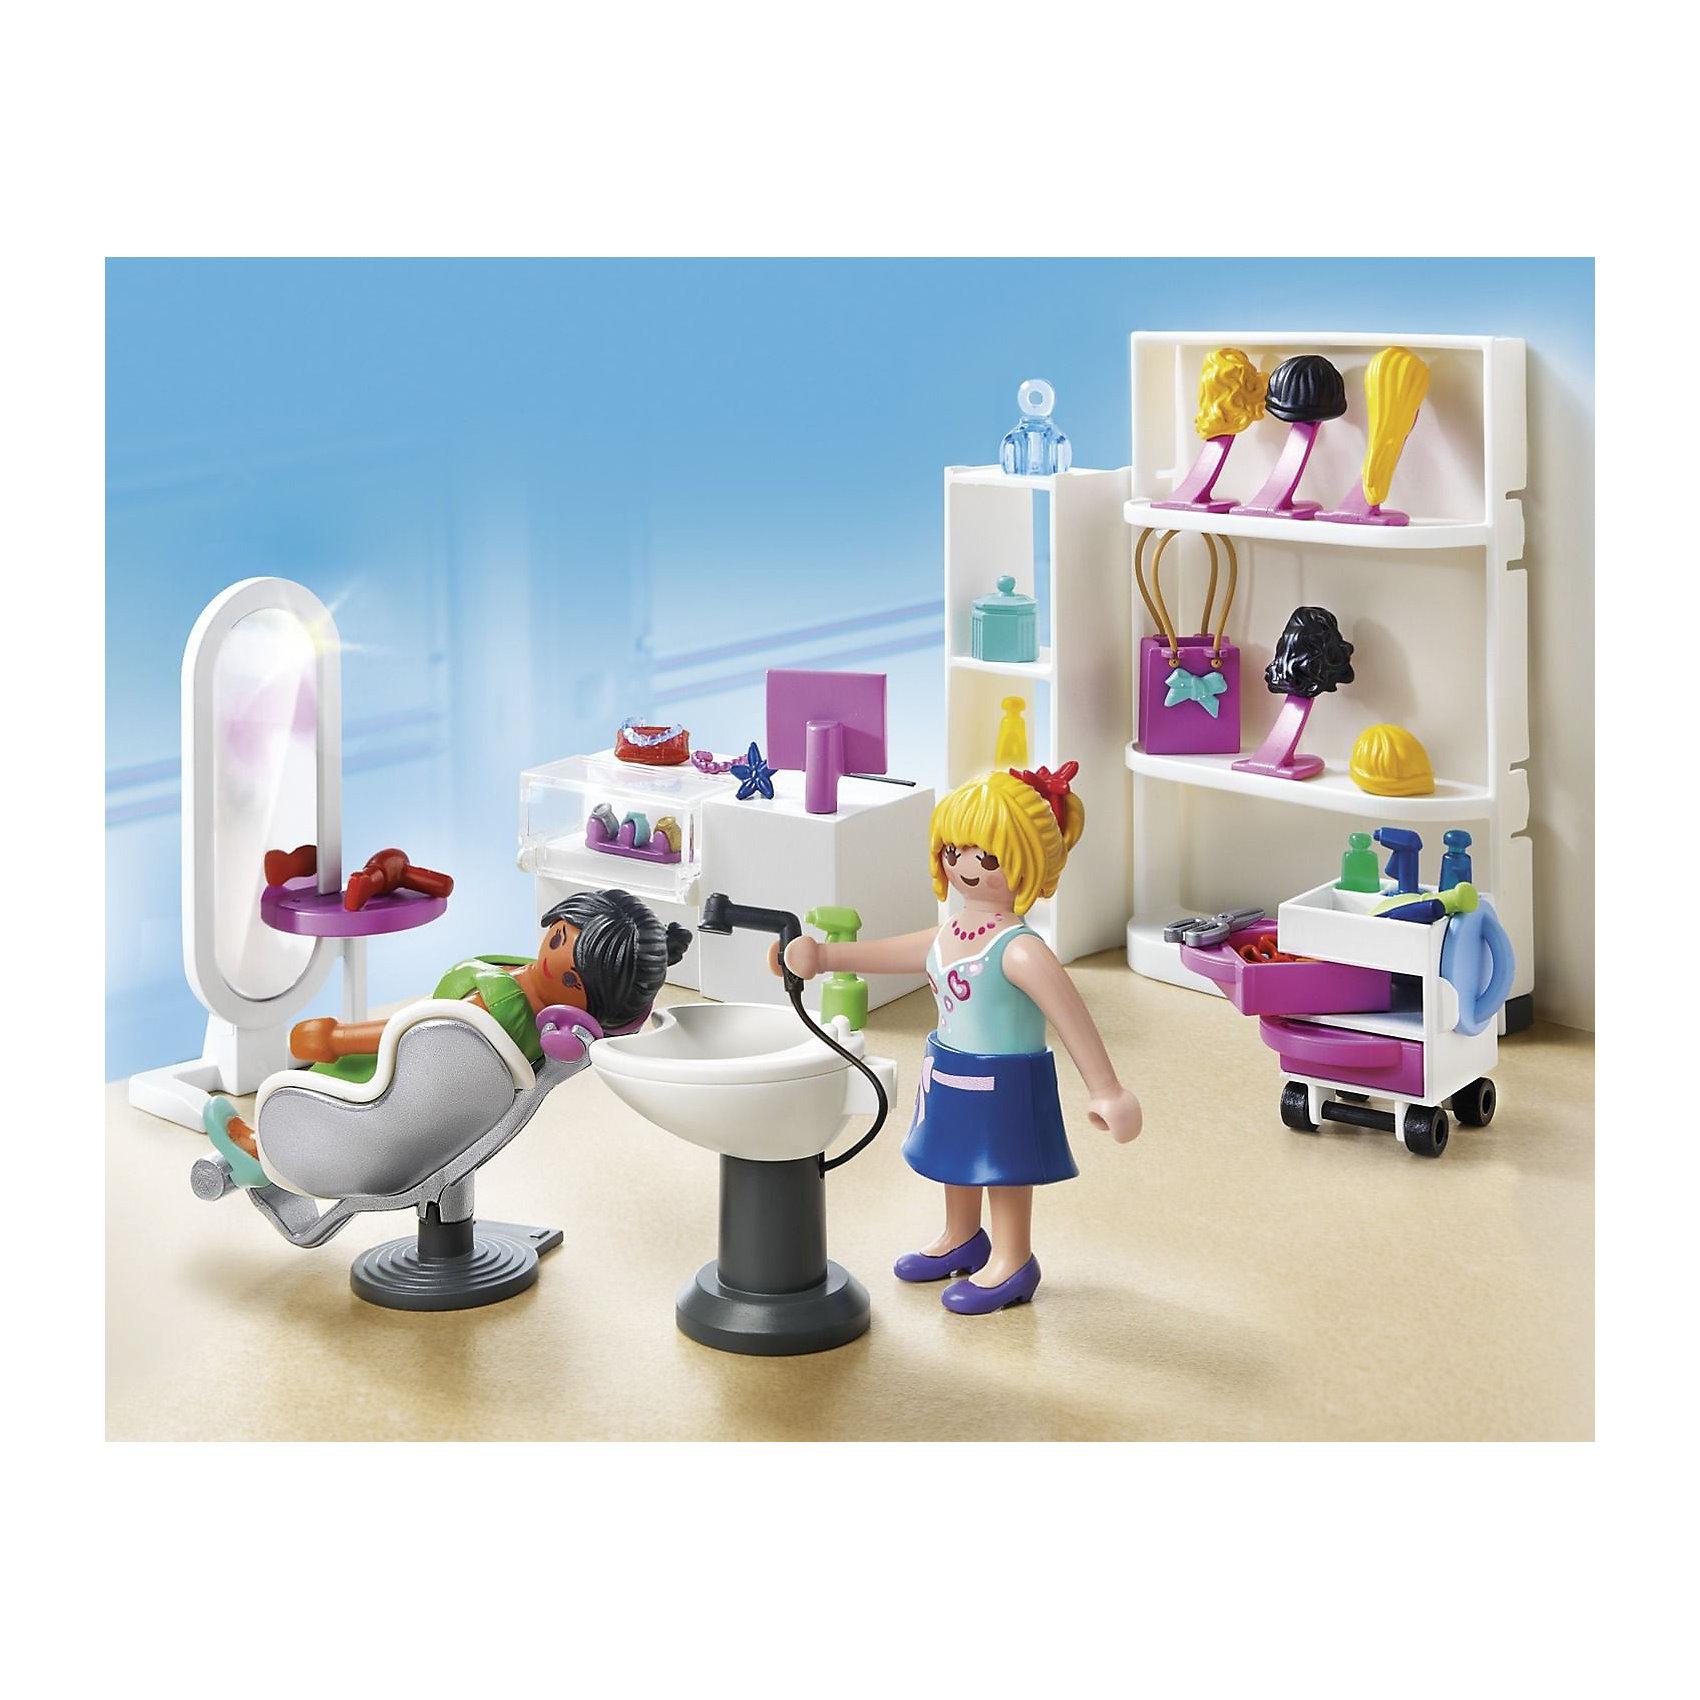 PLAYMOBIL® Торговый центр: Салон красоты, PLAYMOBIL playmobil® playmobil 5546 парк развлечений продавец шаров smileyworld